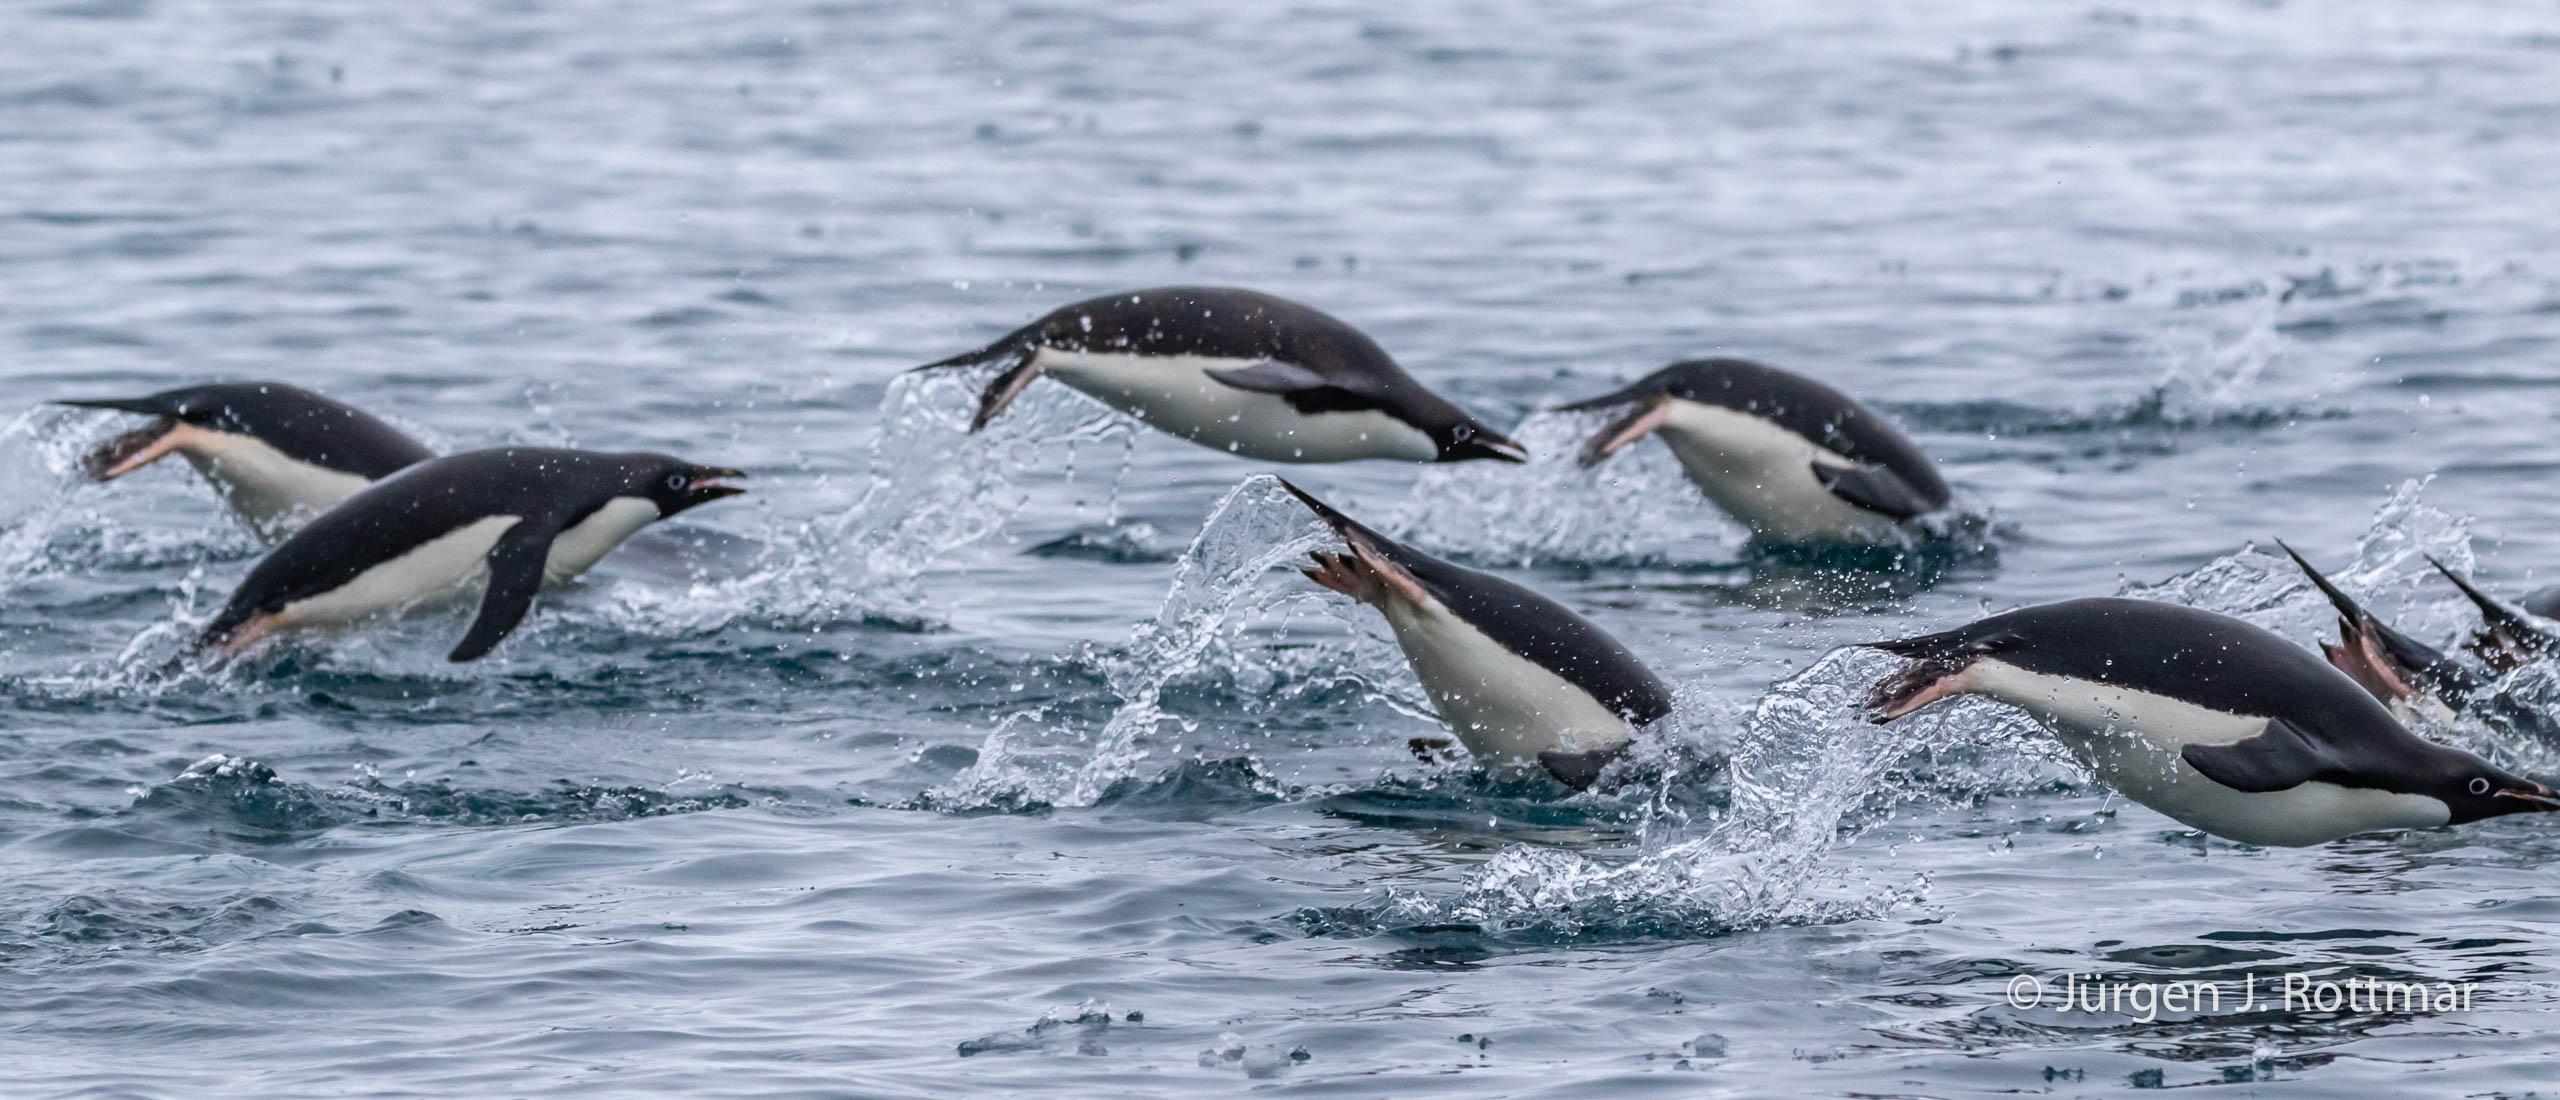 Juergen J Rottmar Antarctic Peninsula R6A4363